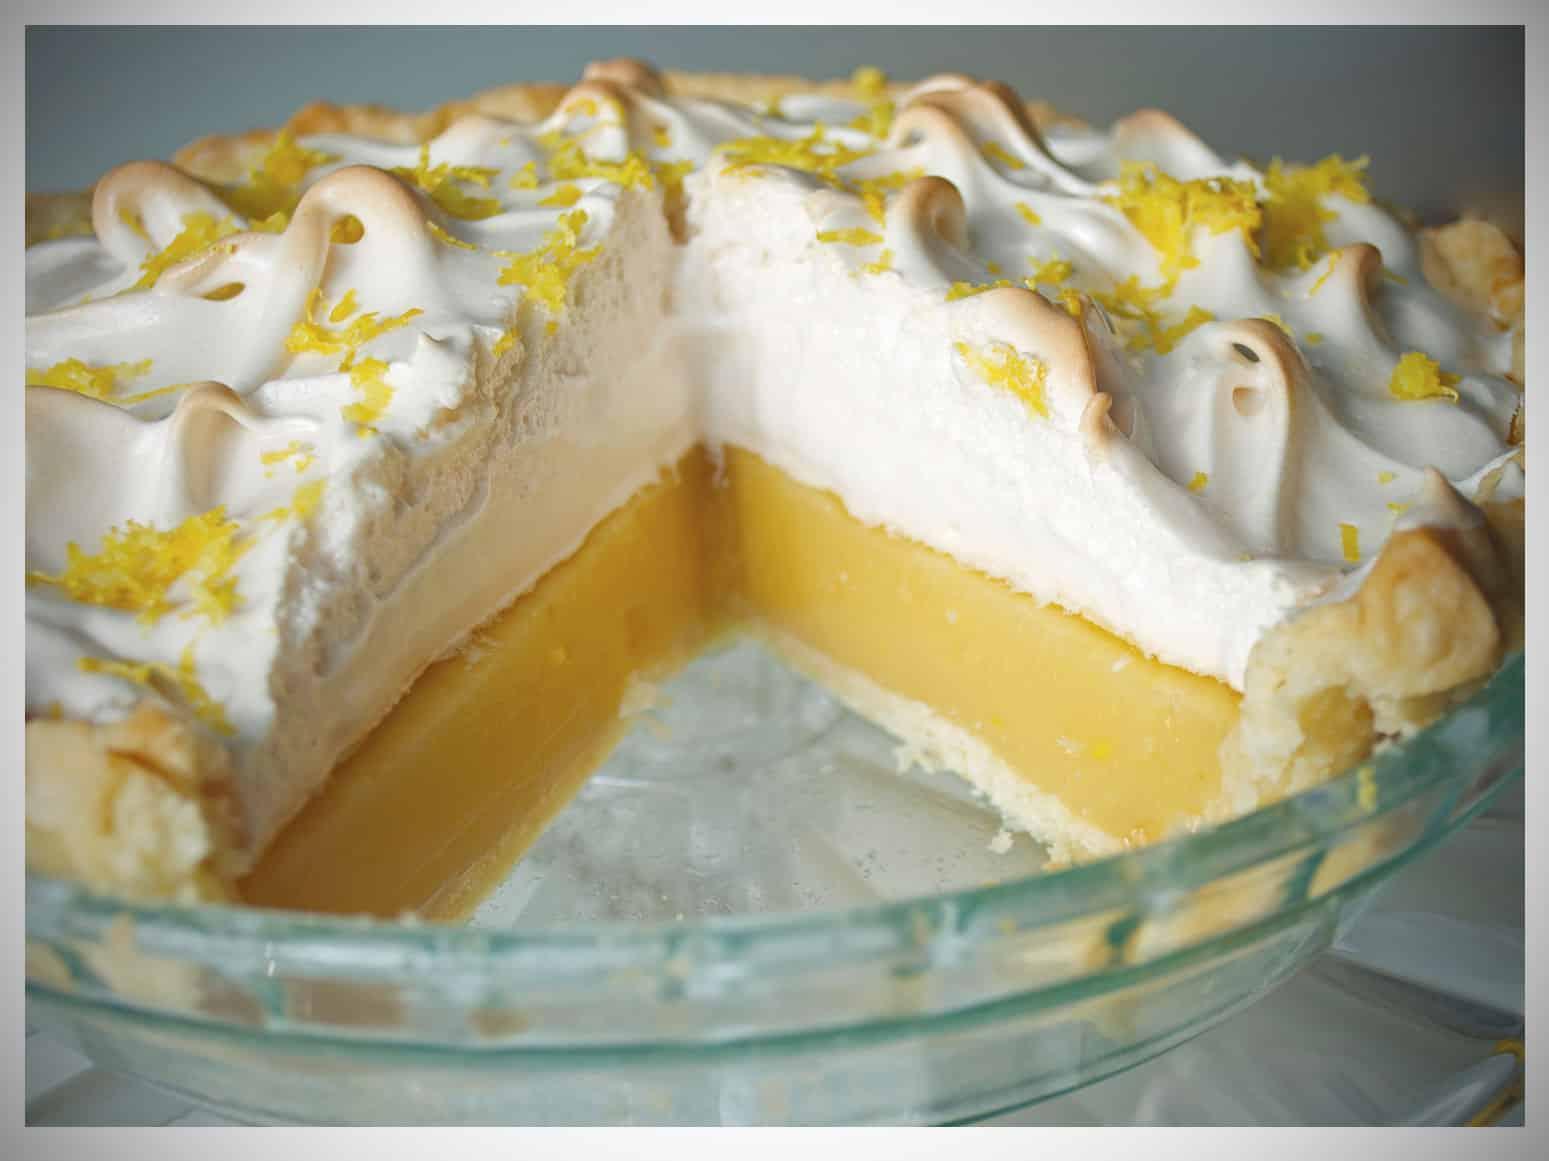 Lavender Infused Lemon Meringue Pie | OfBatterAndDough.com